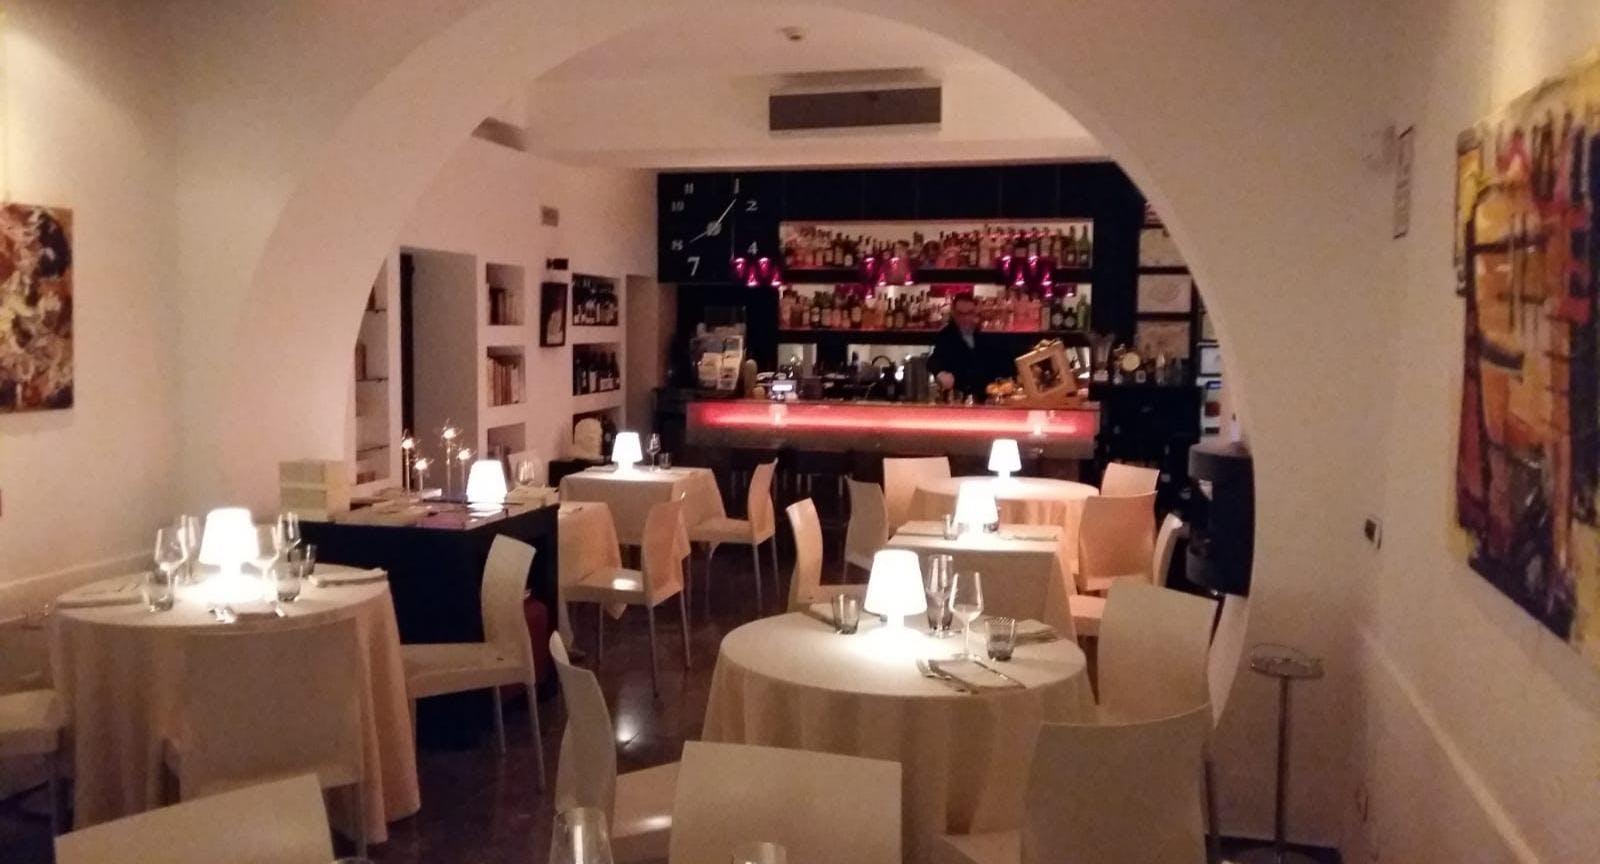 Galleria Cefalù image 3